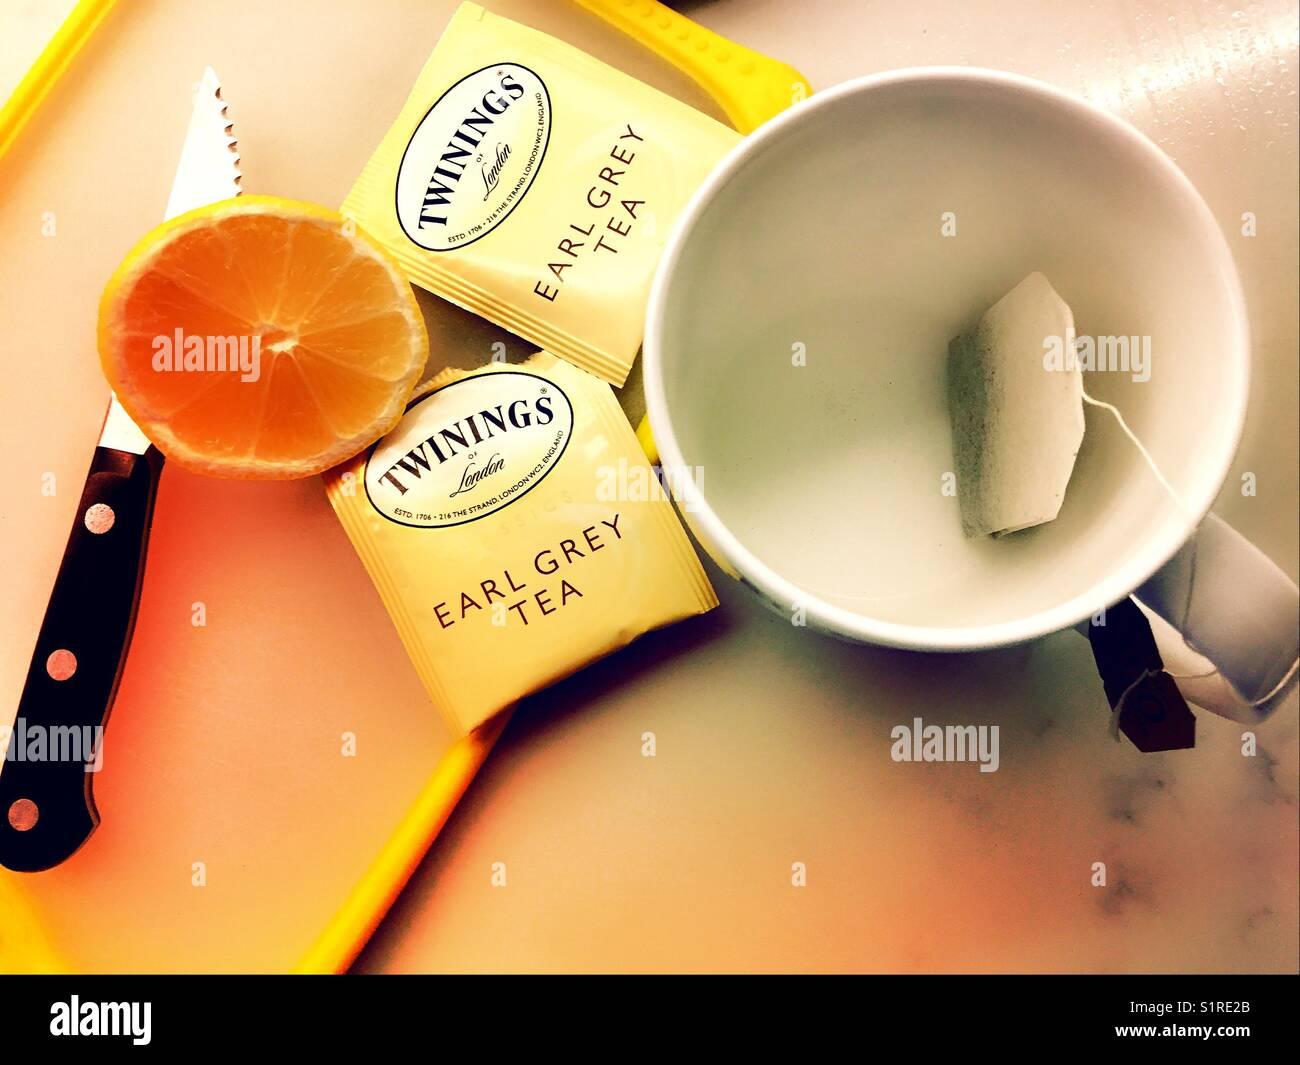 how to drink earl grey tea lemon